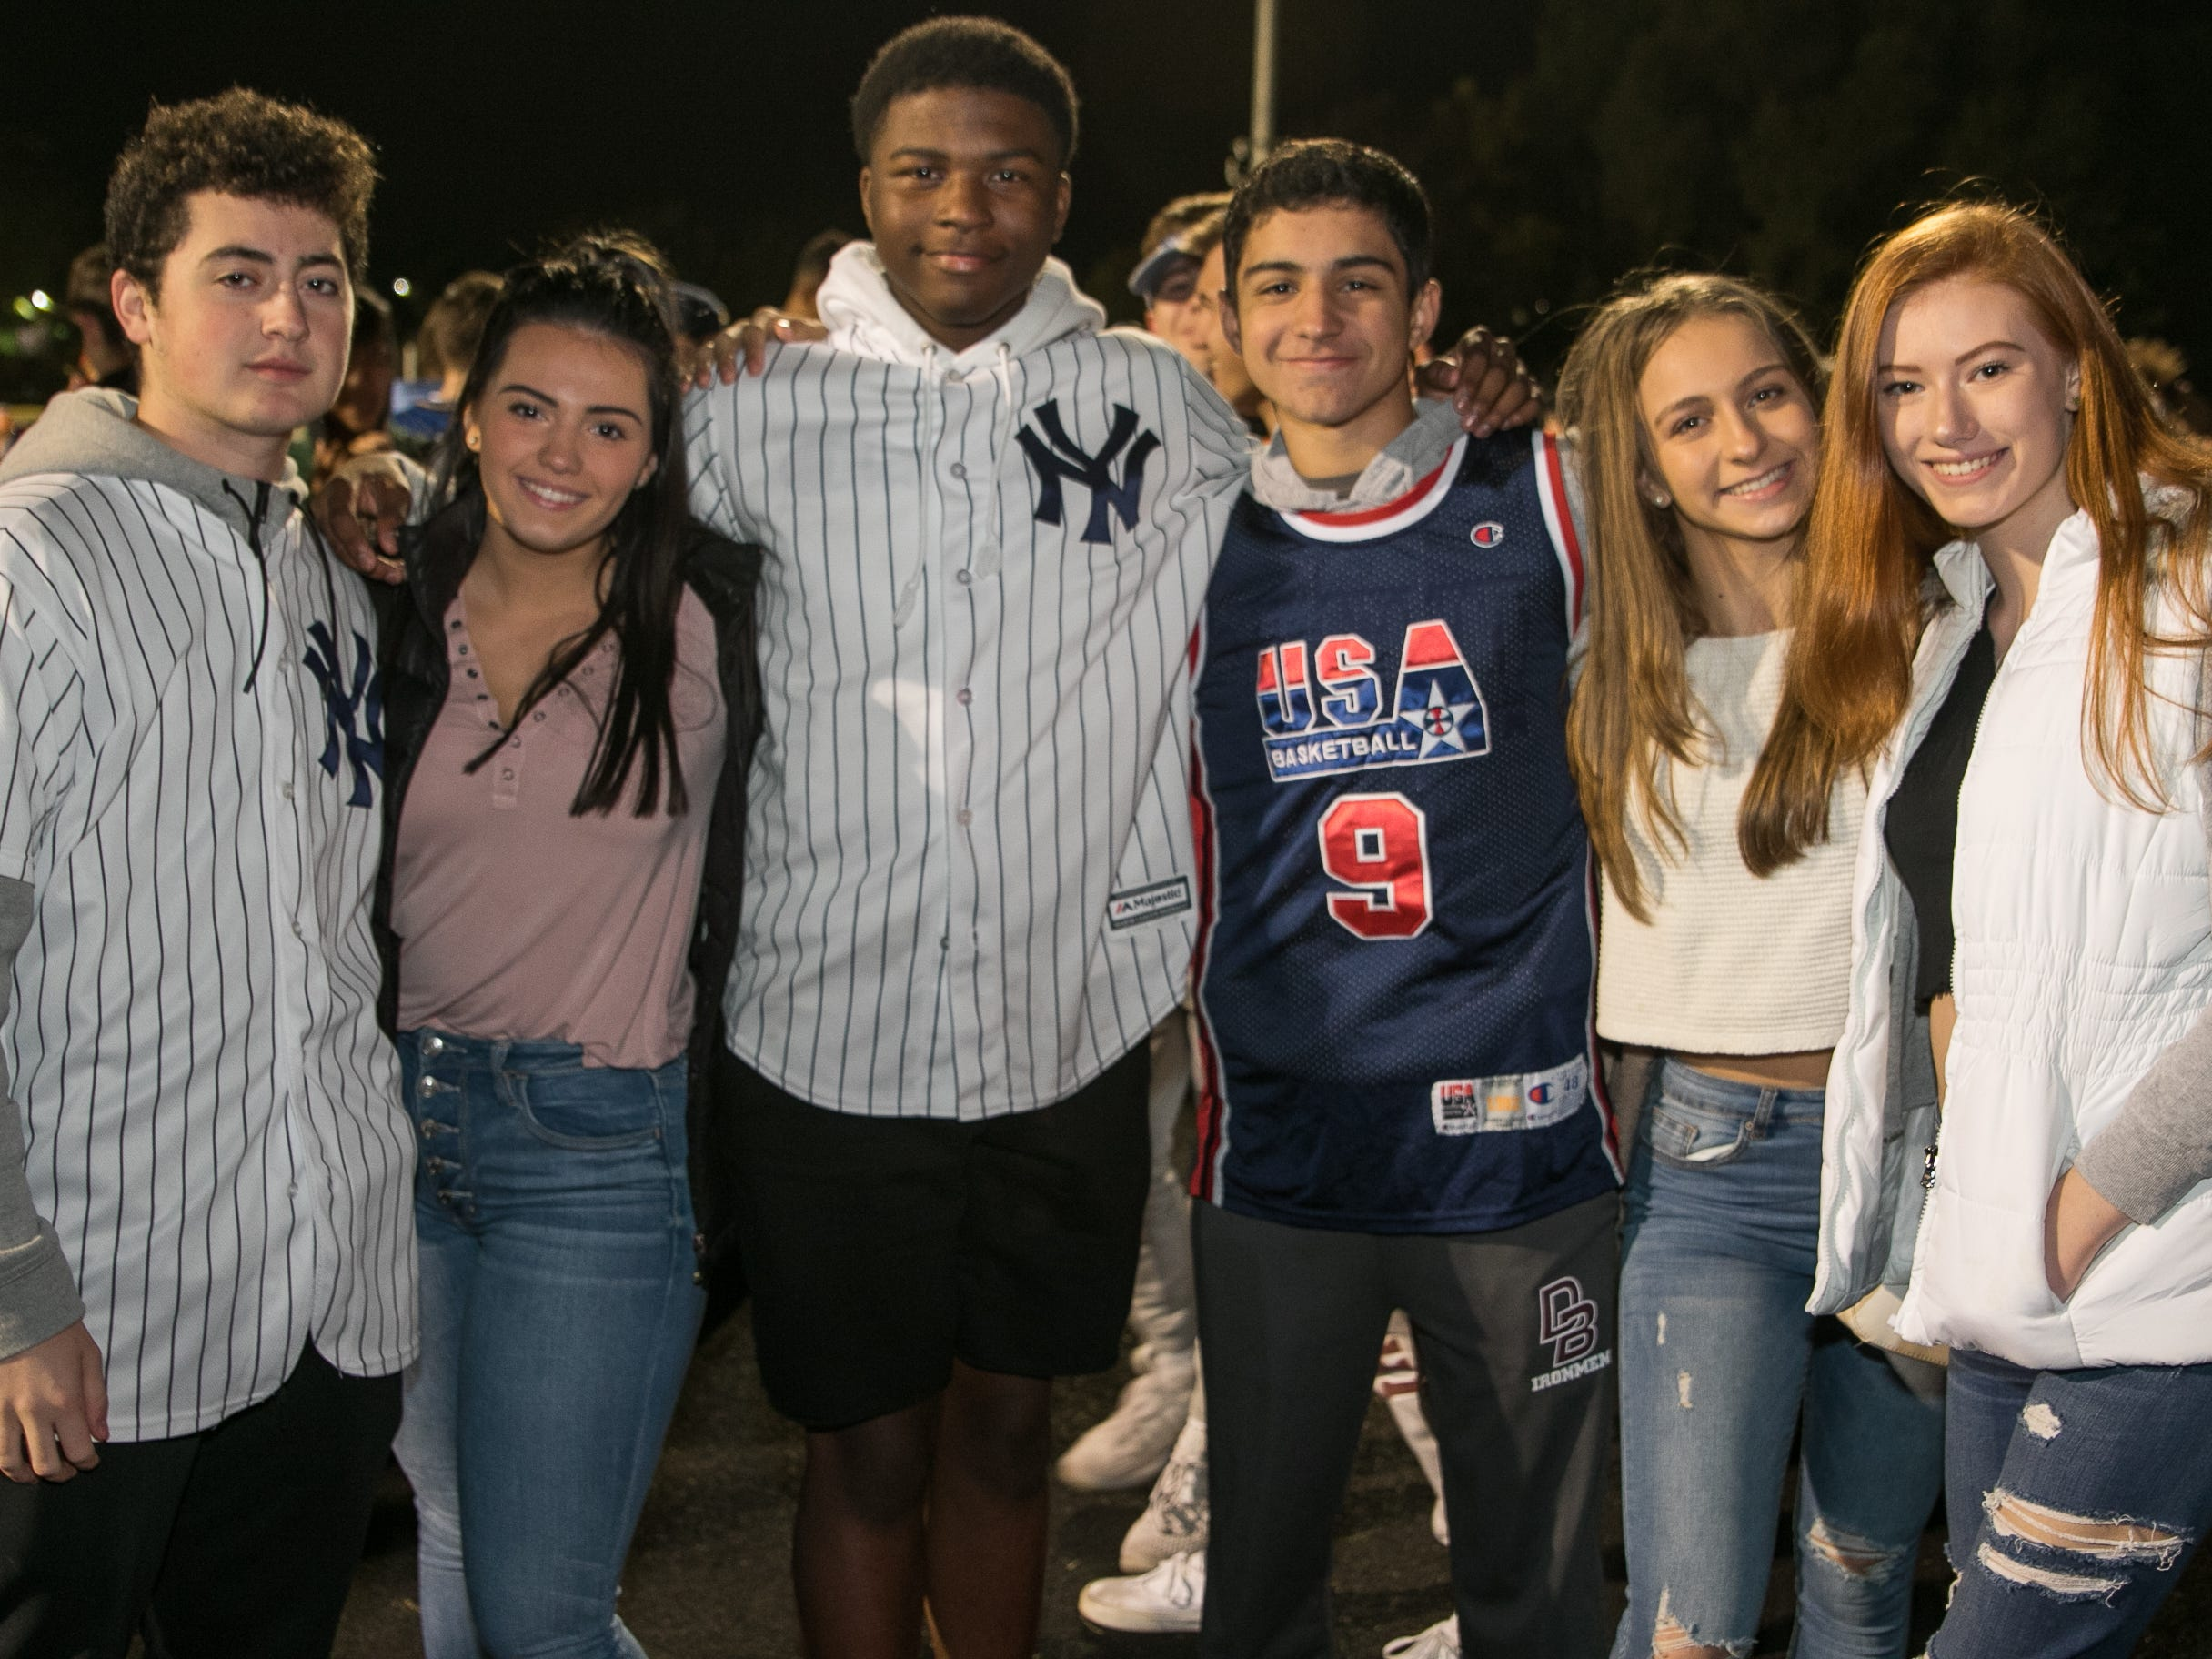 Fans at the Don Bosco Prep versus Paramus Catholic high school football game held at Paramus Catholic High School. 10/26/2018